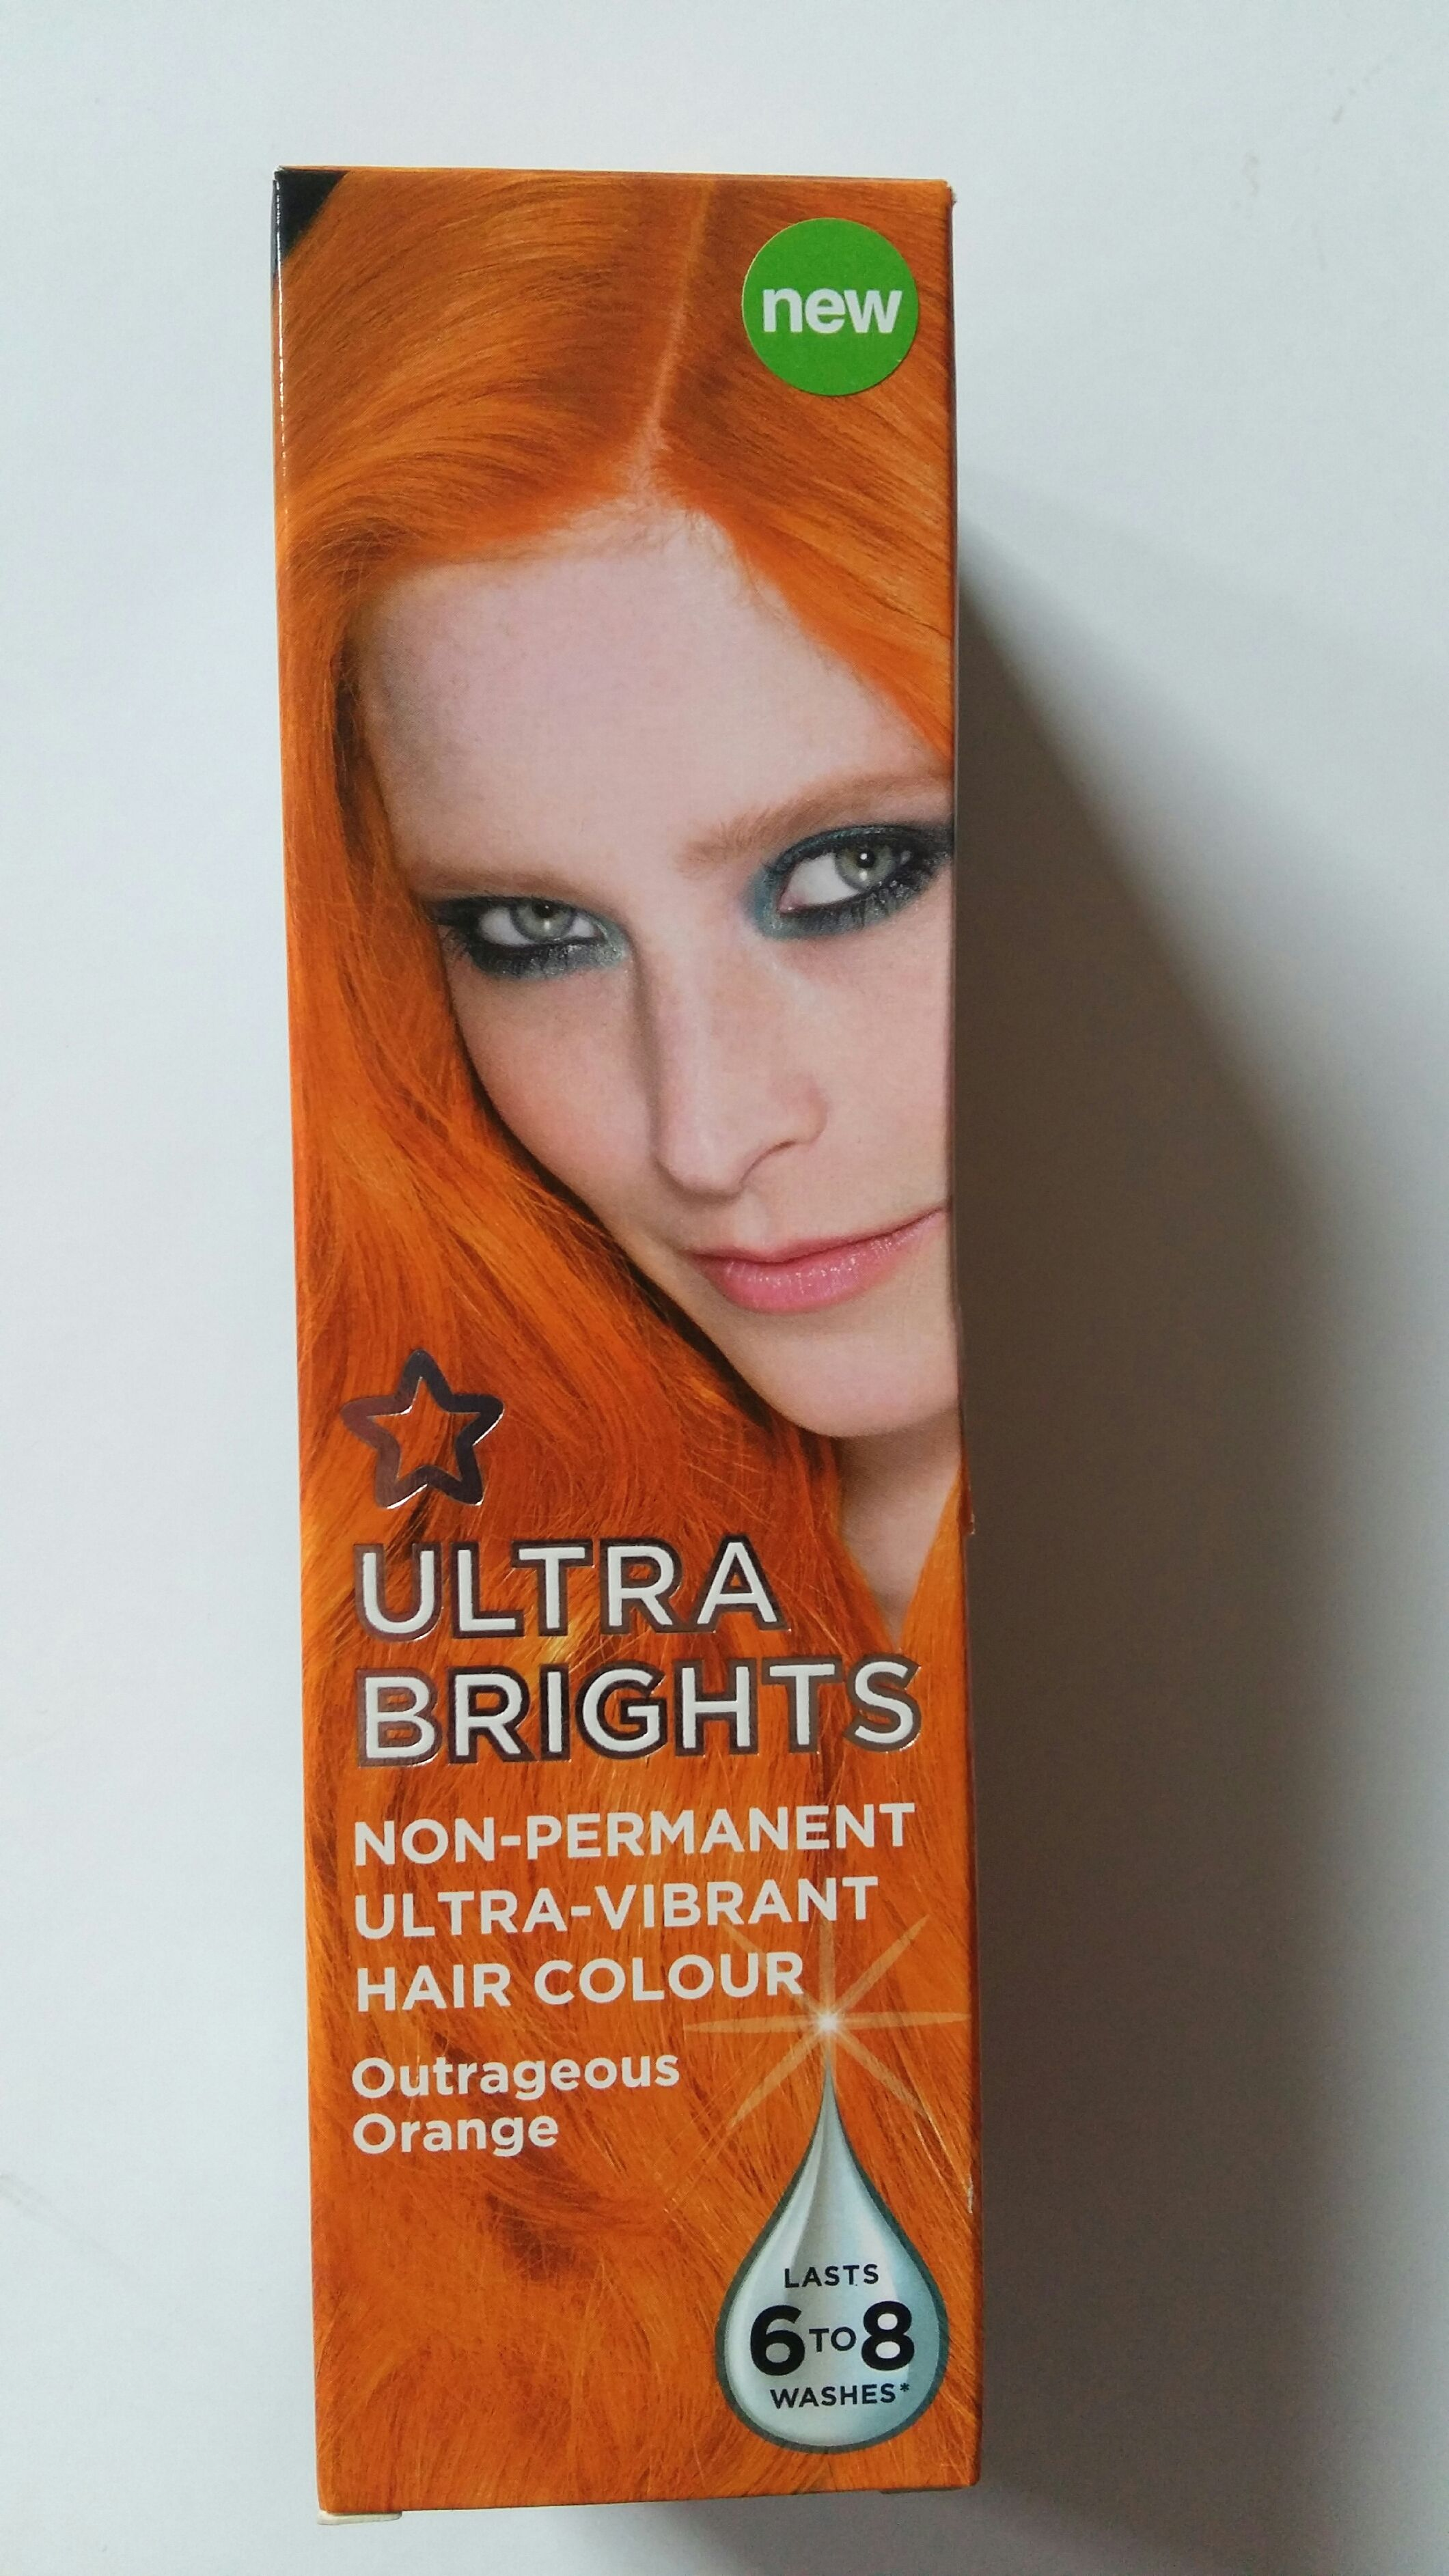 New Superdrug Vibrance Ultra Bright Outrageous Orange Hair Colour